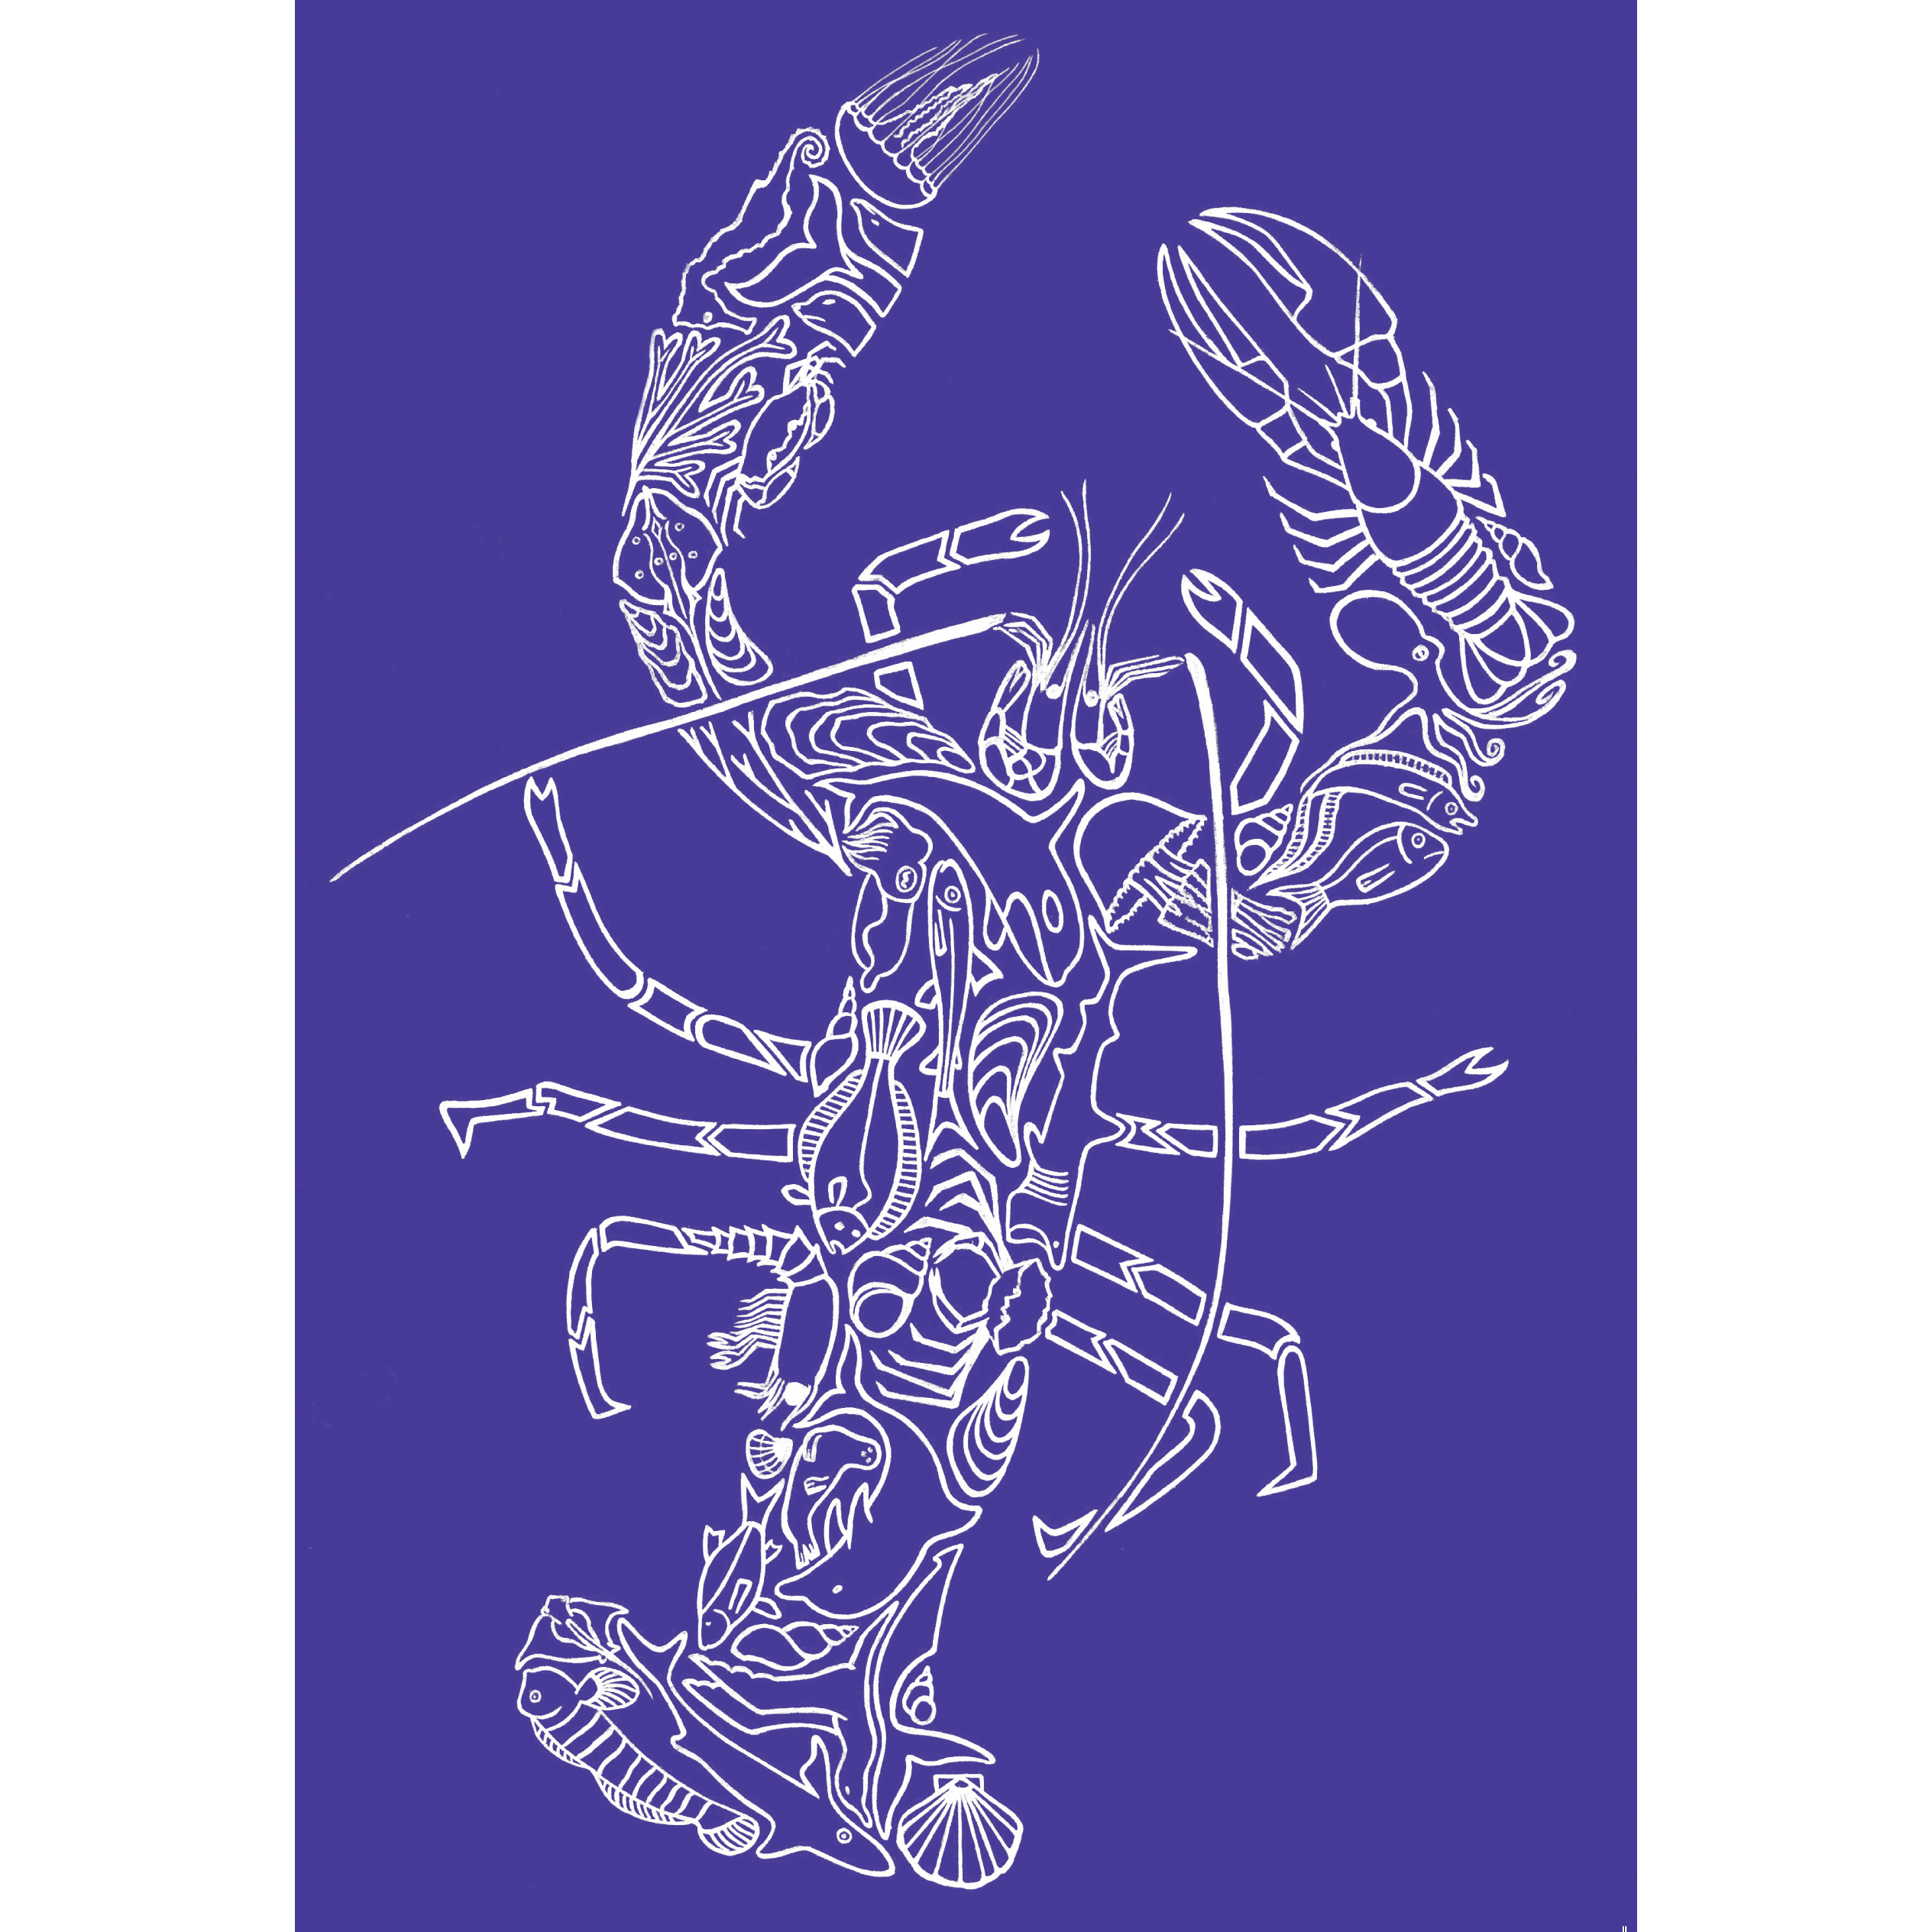 Greeting Card by designer Simon Thomas 'A Lobster Mosaic' 00258